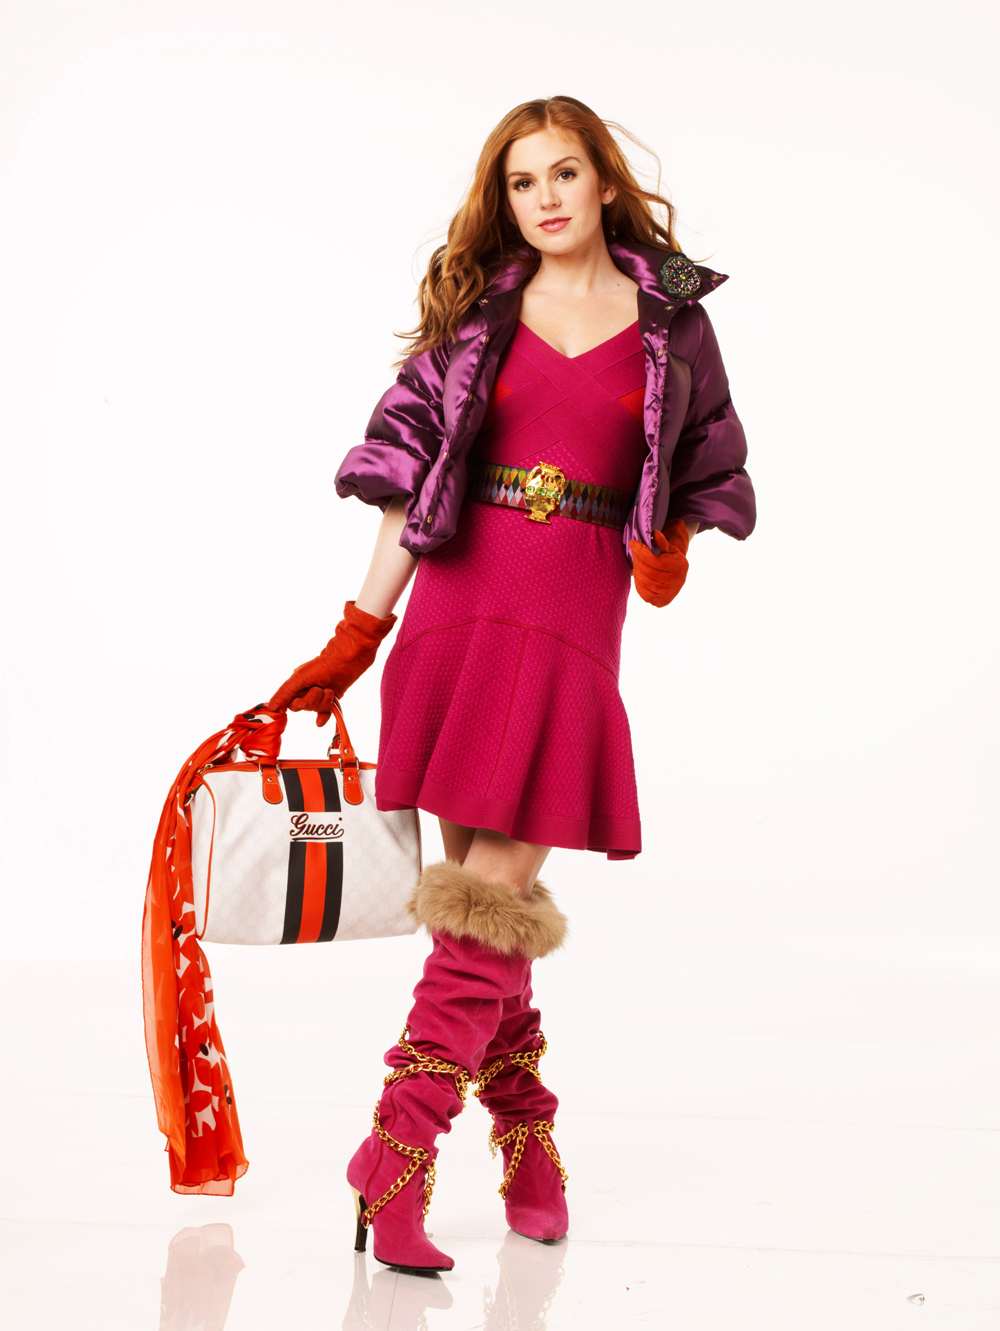 Isla Fisher Movies Isla Fisher as Rebecca